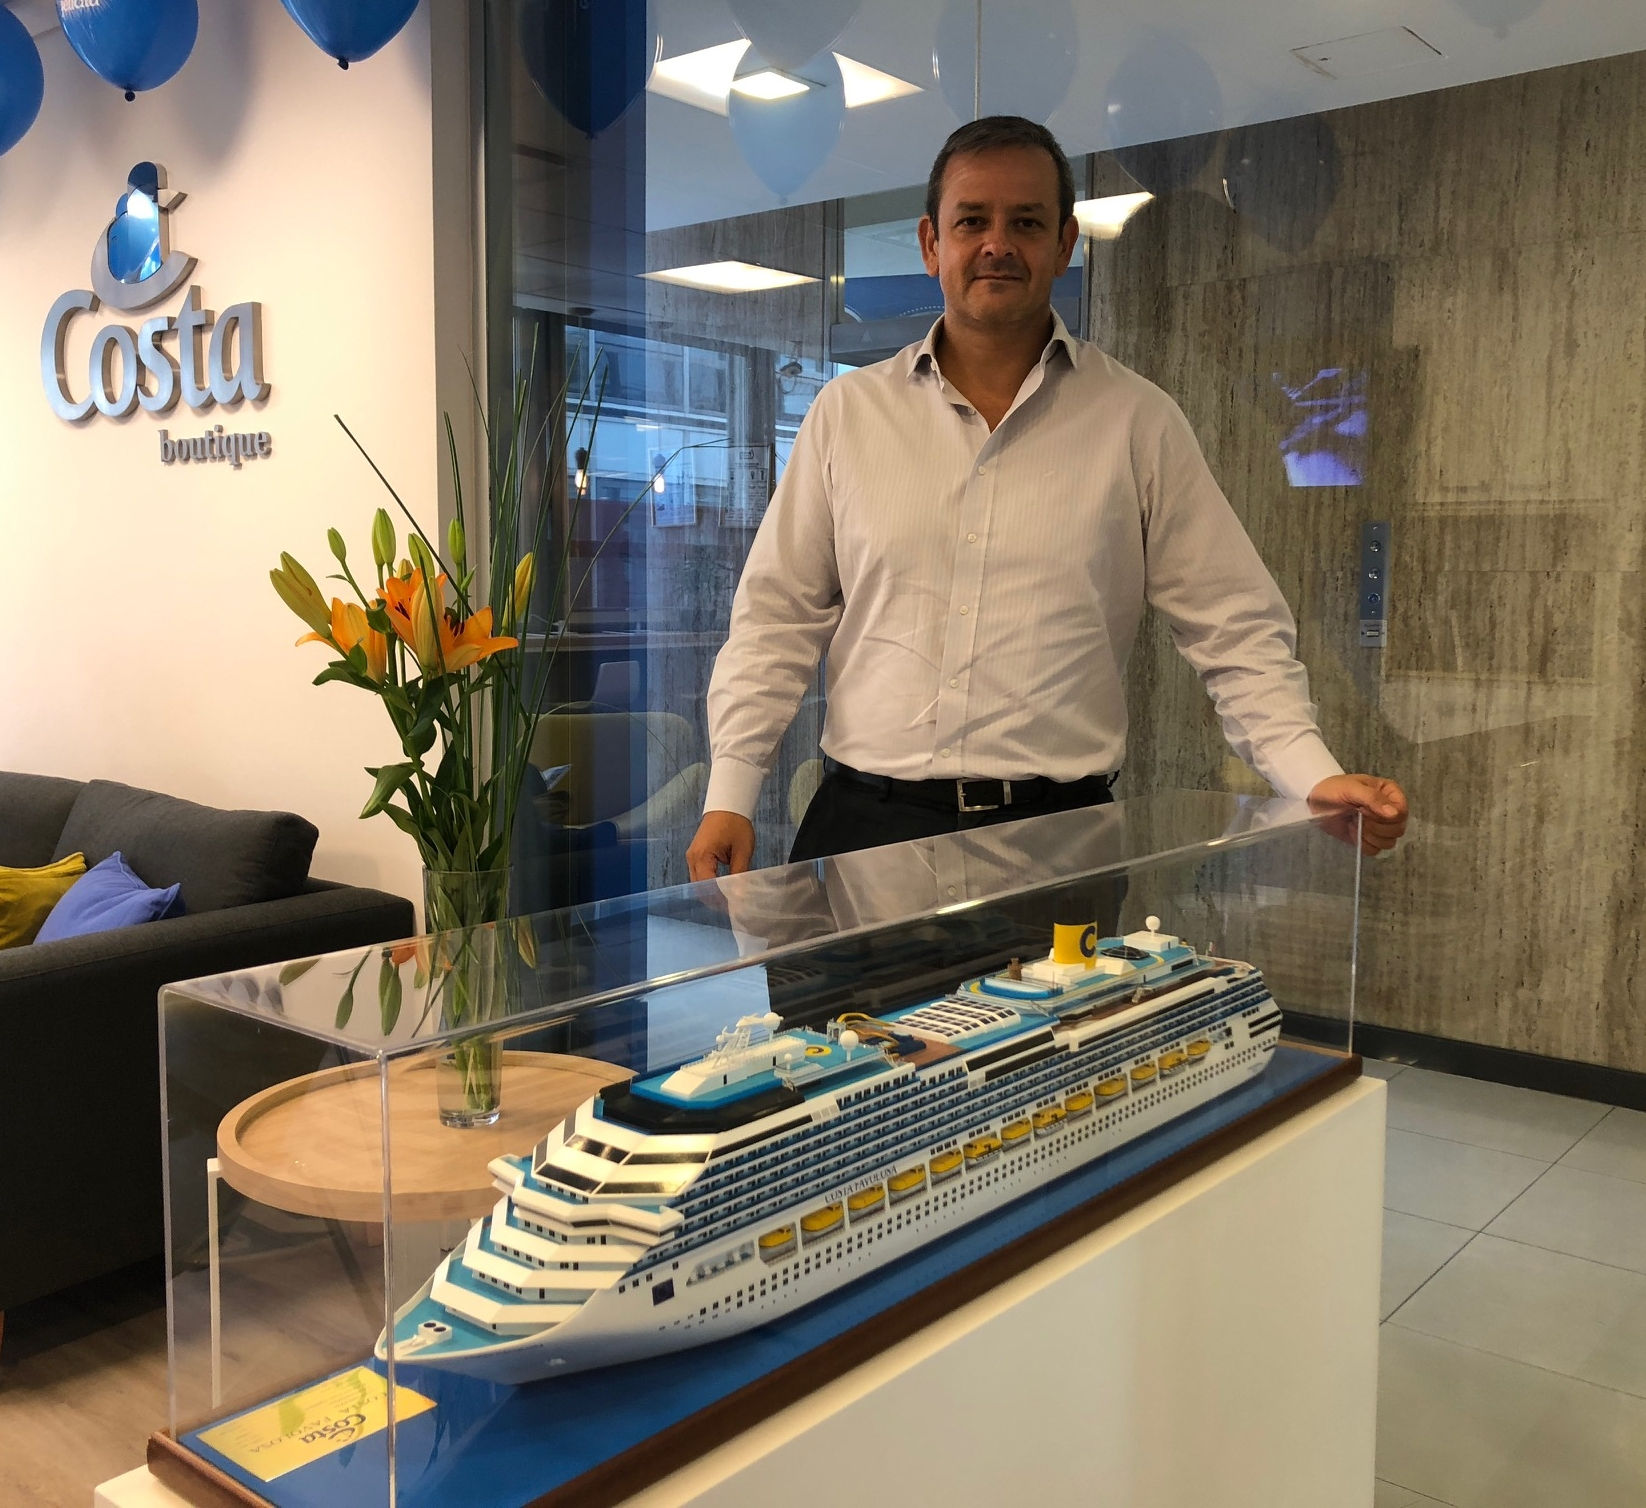 Maximiliano González, Gerente Comercial de Costa Cruceros en Argentina